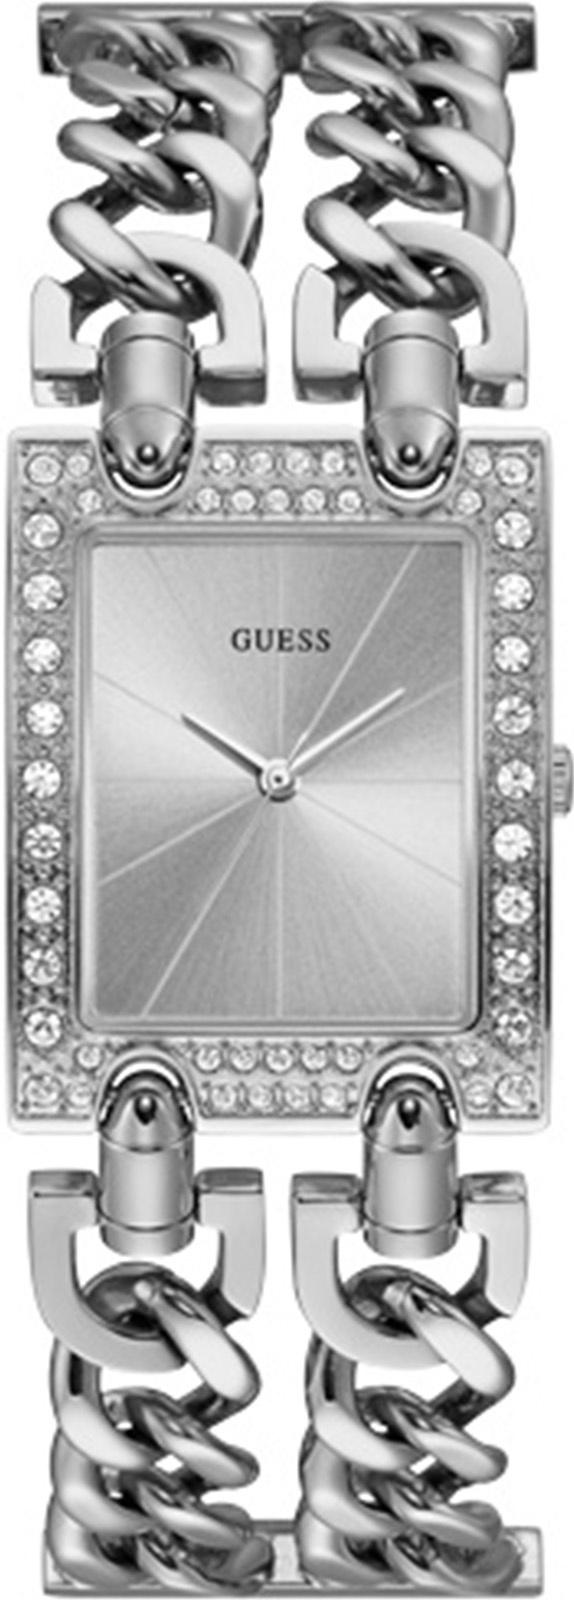 Наручные часы Guess MOD HEAVY METAL женские часы guess w0571l1